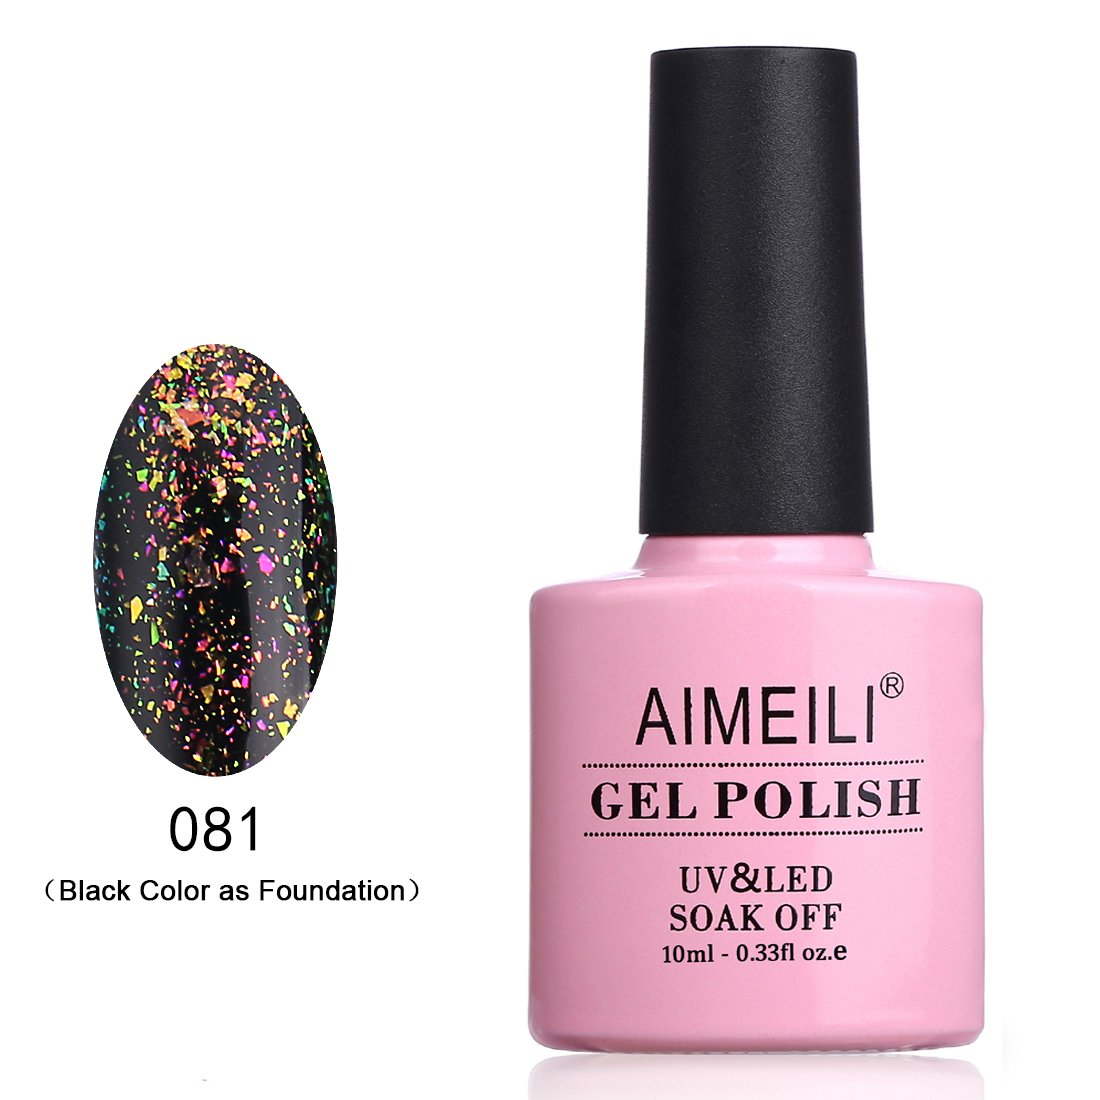 AIMEILI Soak Off UV LED Galaxy Paranoid Collection Clear Glitter Gel Nail Polish - Venus's Hug (081) 10ml